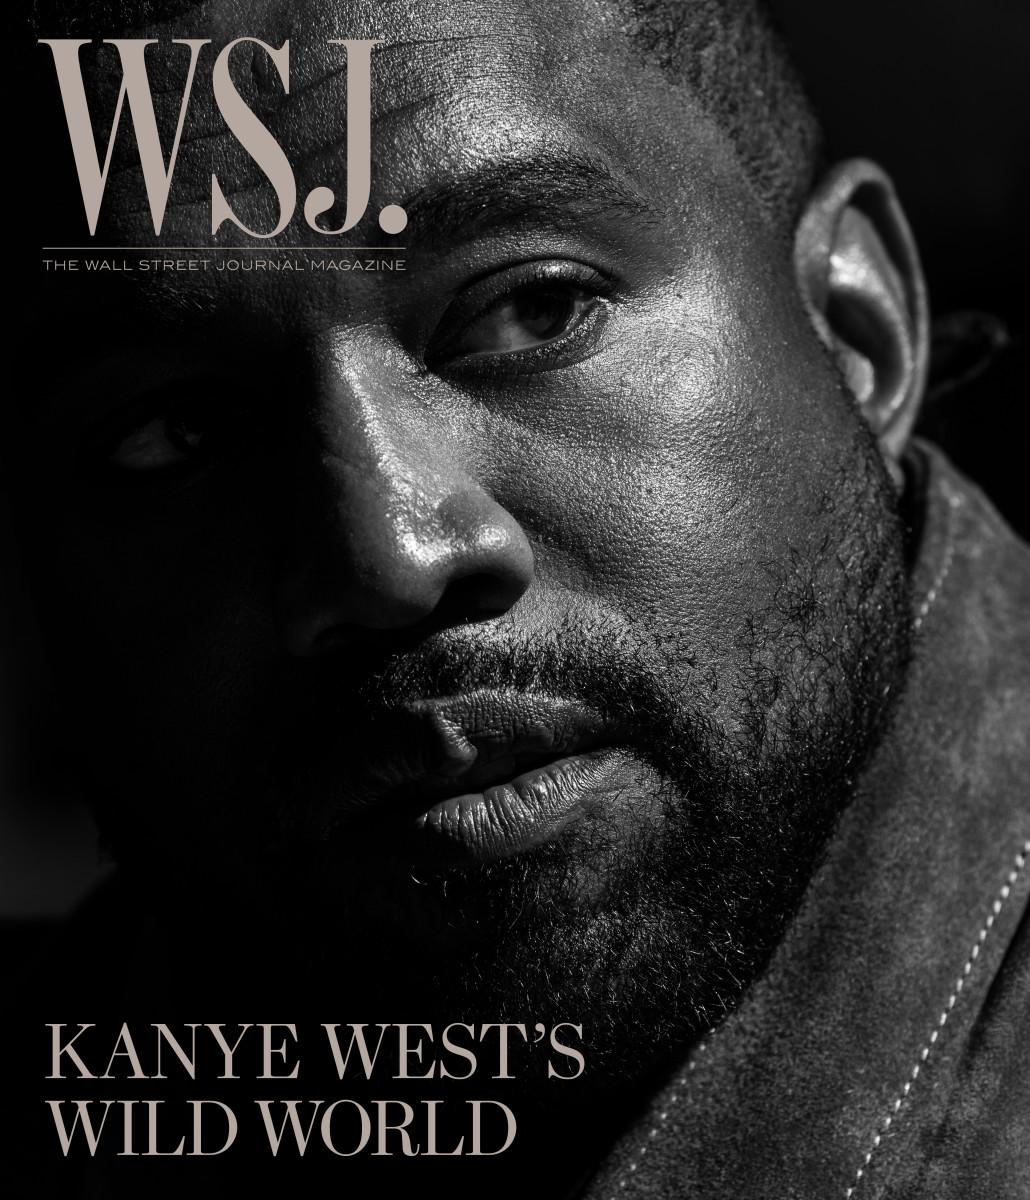 kanye-west-wsj-magazine